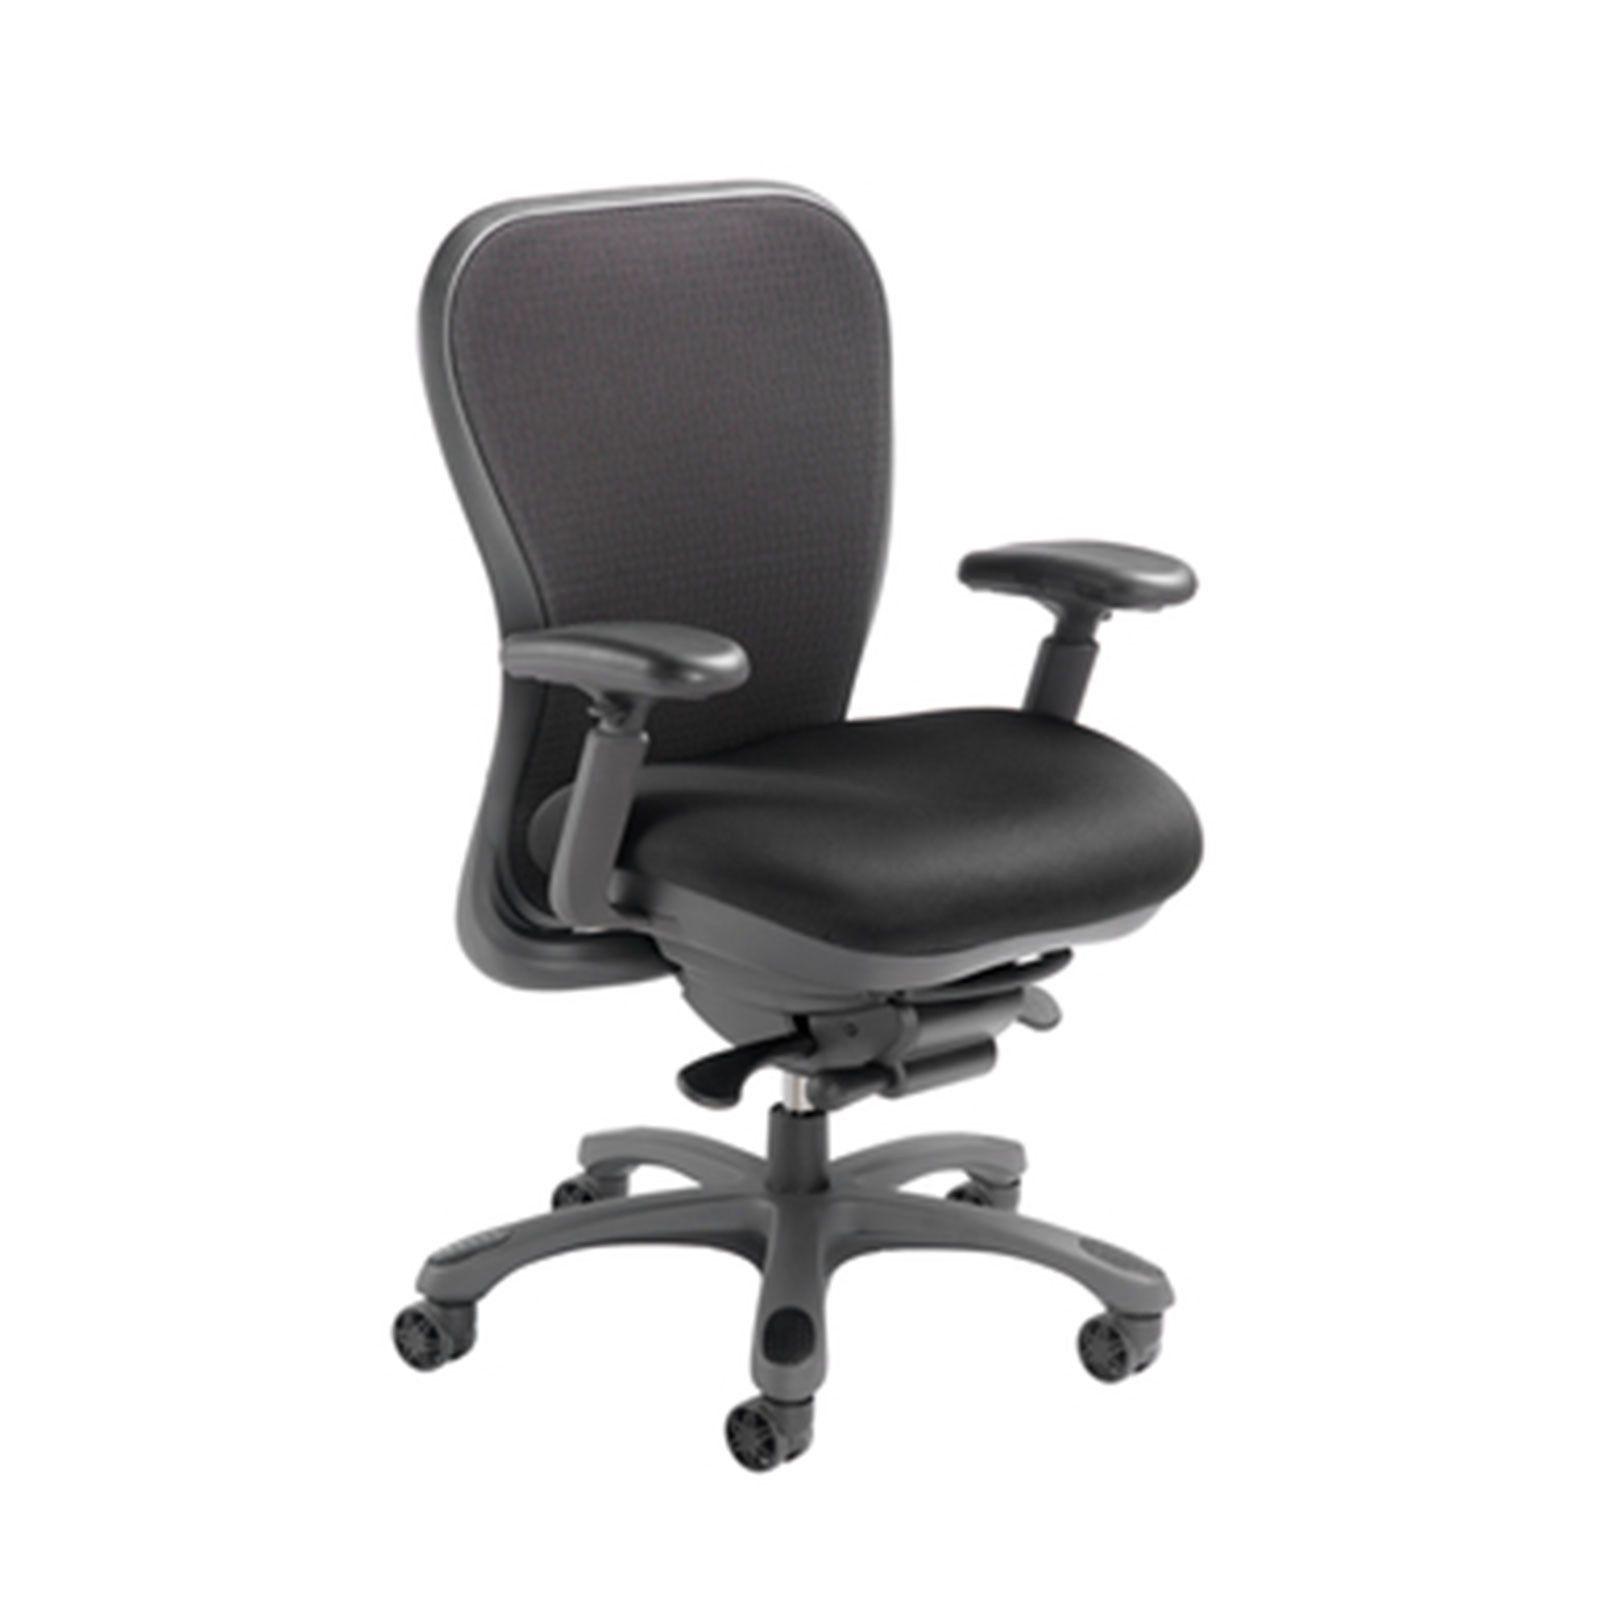 cxo office Stuhl | BüroMöbel | Pinterest | Nightingale, Executive ...